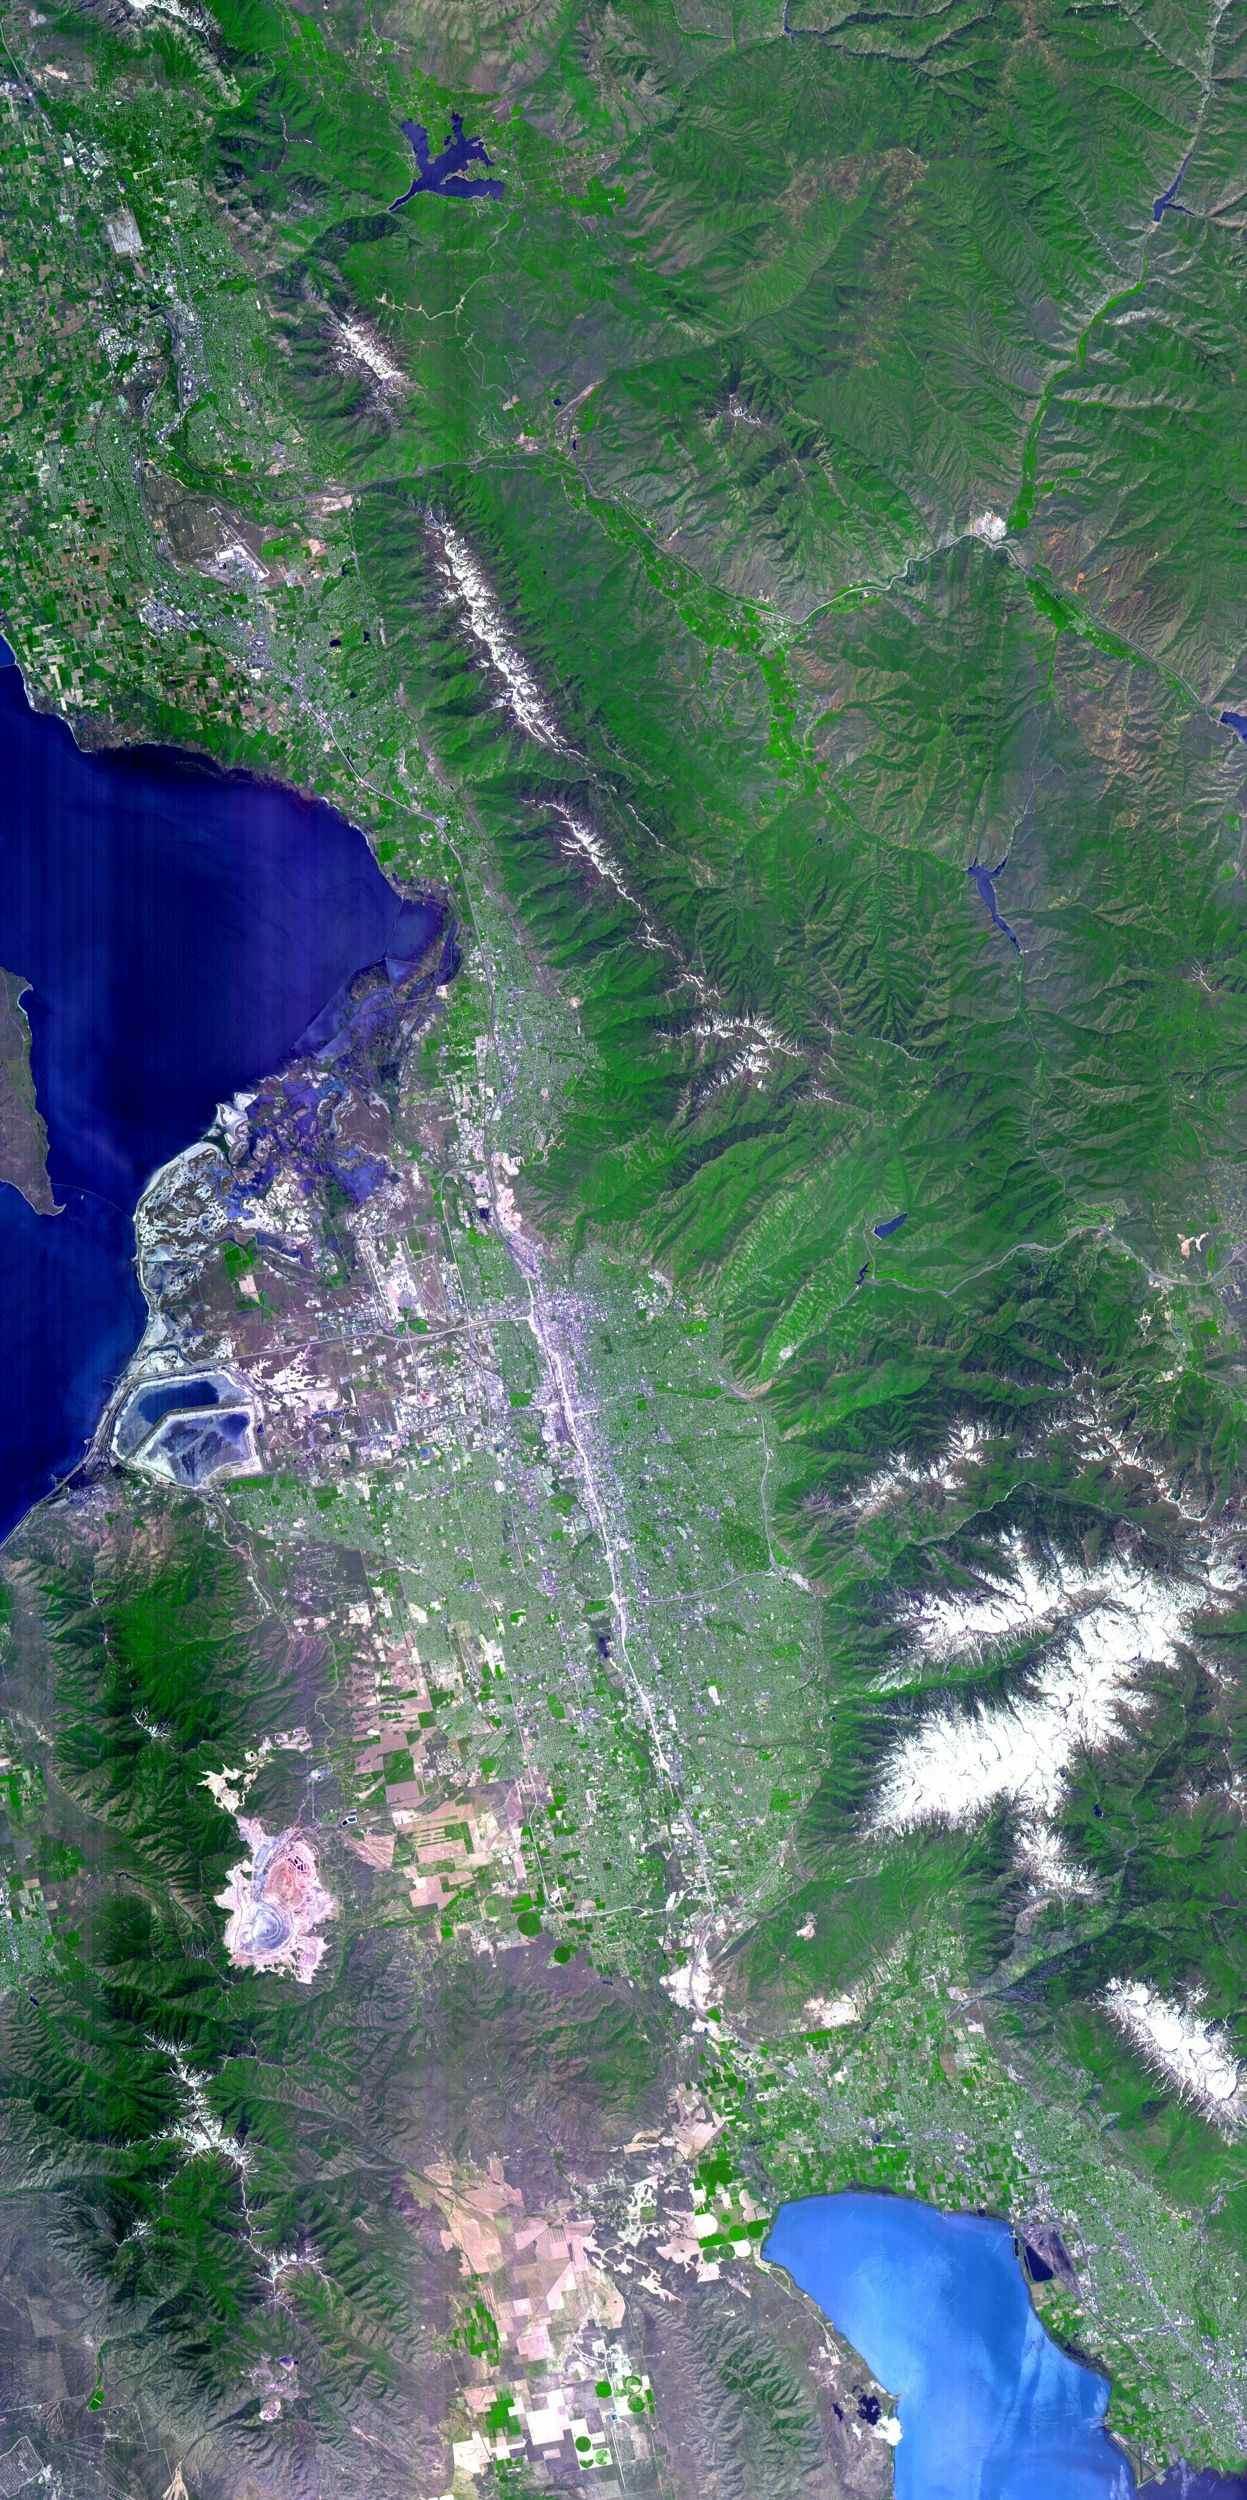 Salt Lake City 2002 Olympics Venues